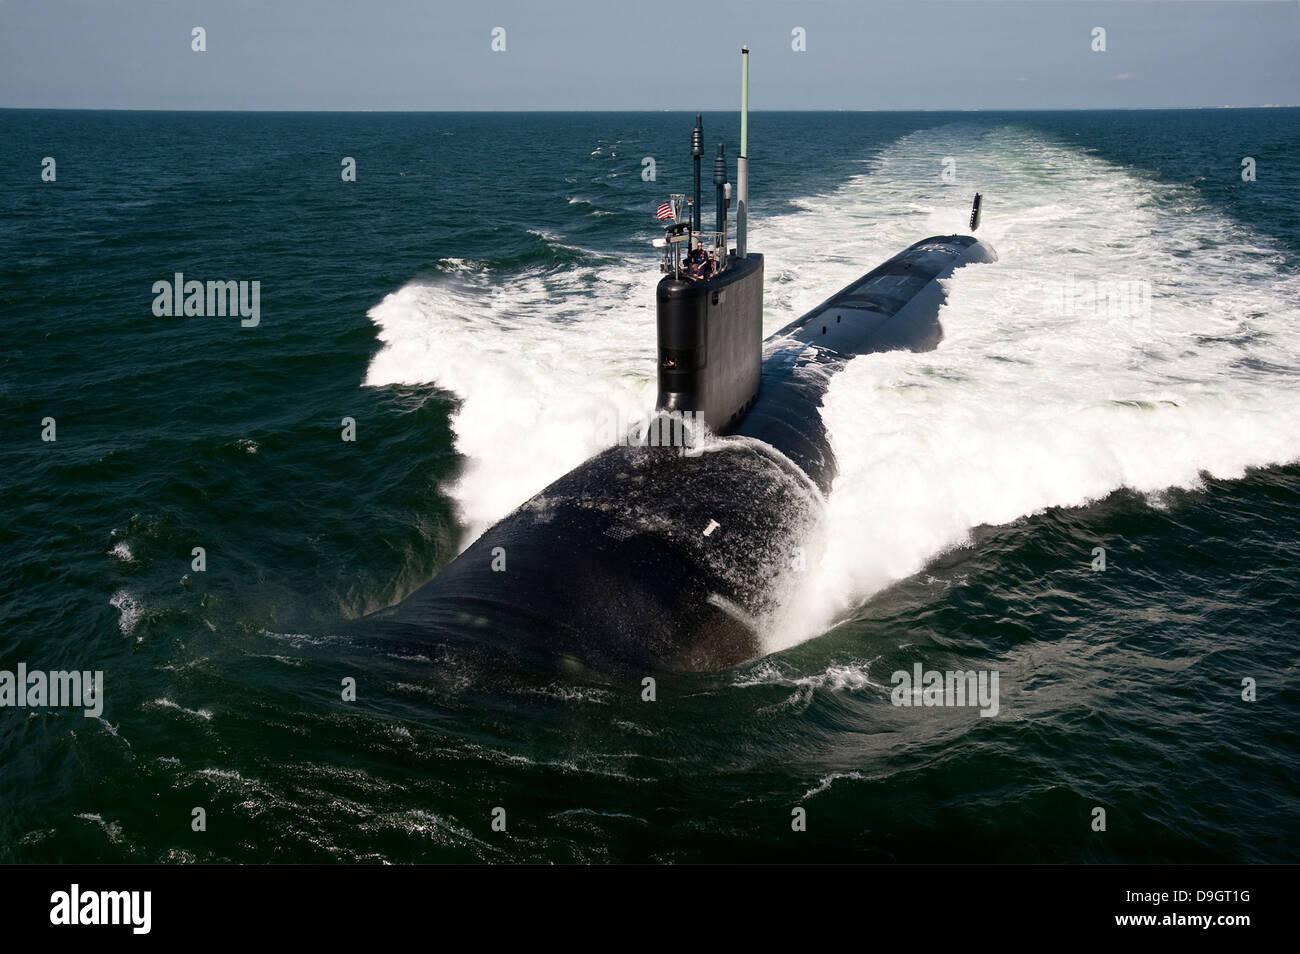 Atlantic Ocean, June 30, 2011 - The Virginia-class attack submarine USS California (SSN 781) underway during sea - Stock Image